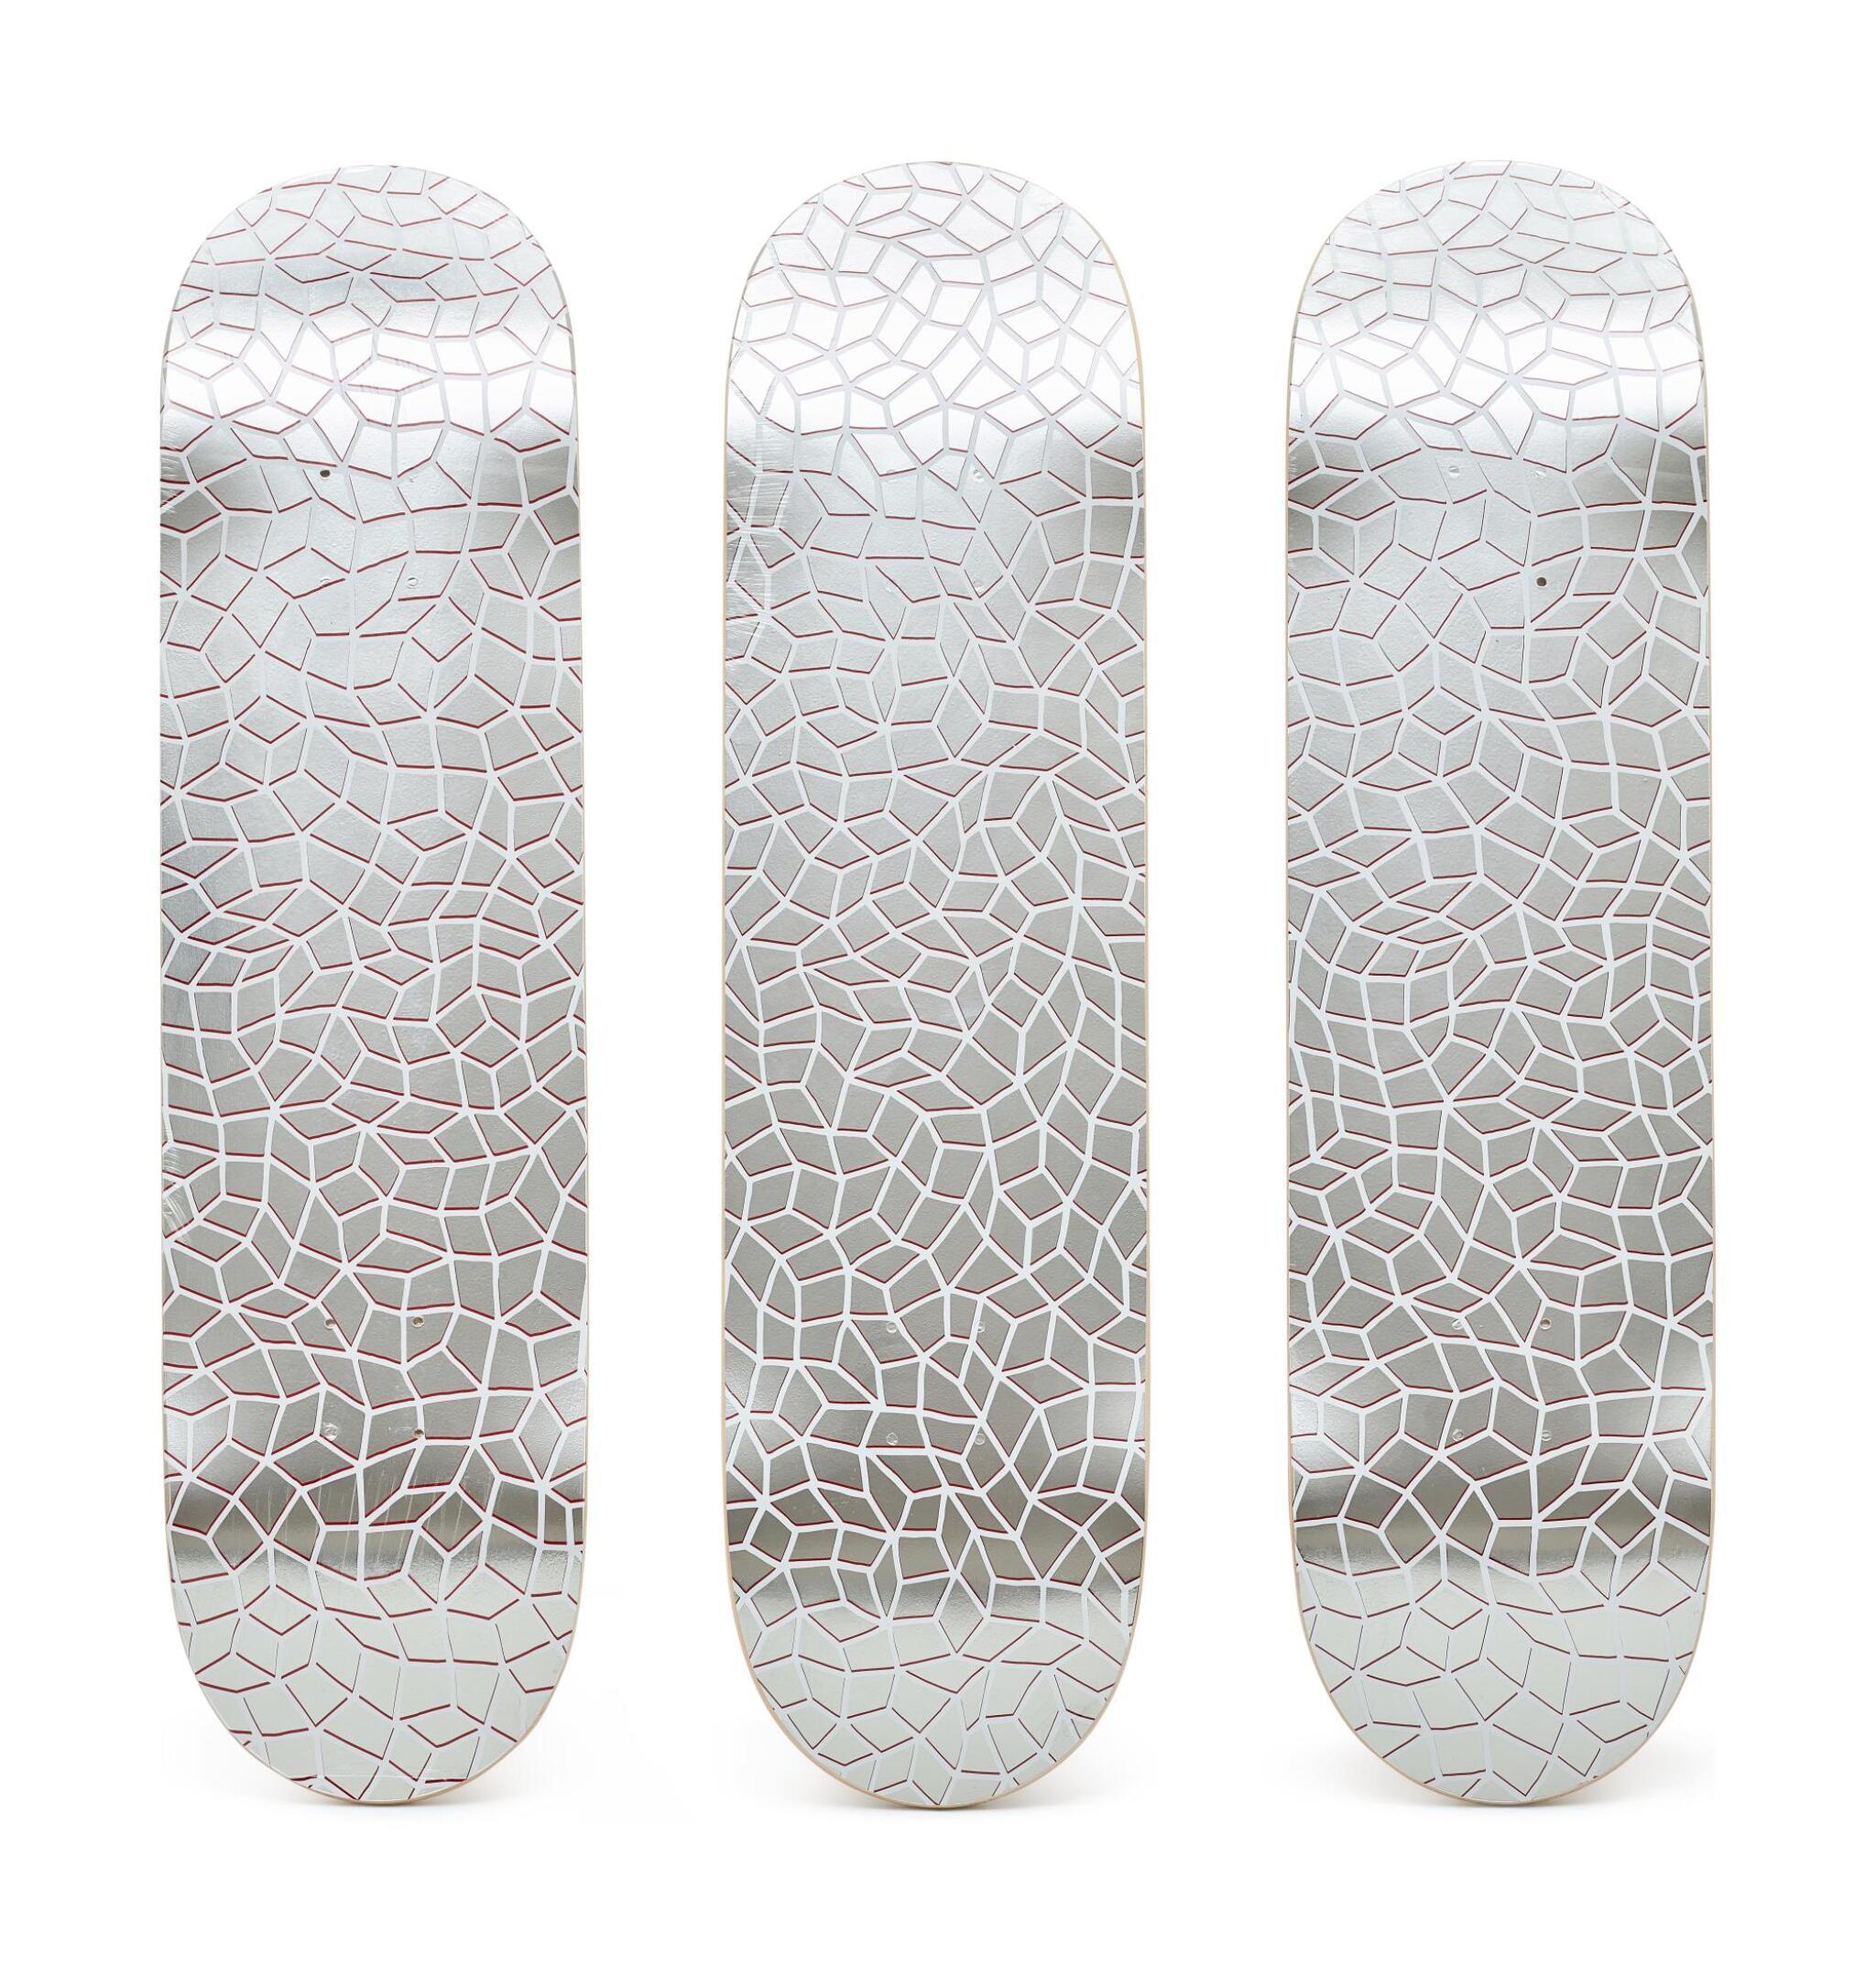 View full screen - View 1 of Lot 9003.  草間彌生 Yayoi Kusama | 無限網滑板(三聯作) Infinity Nets Skateboard (triptych).